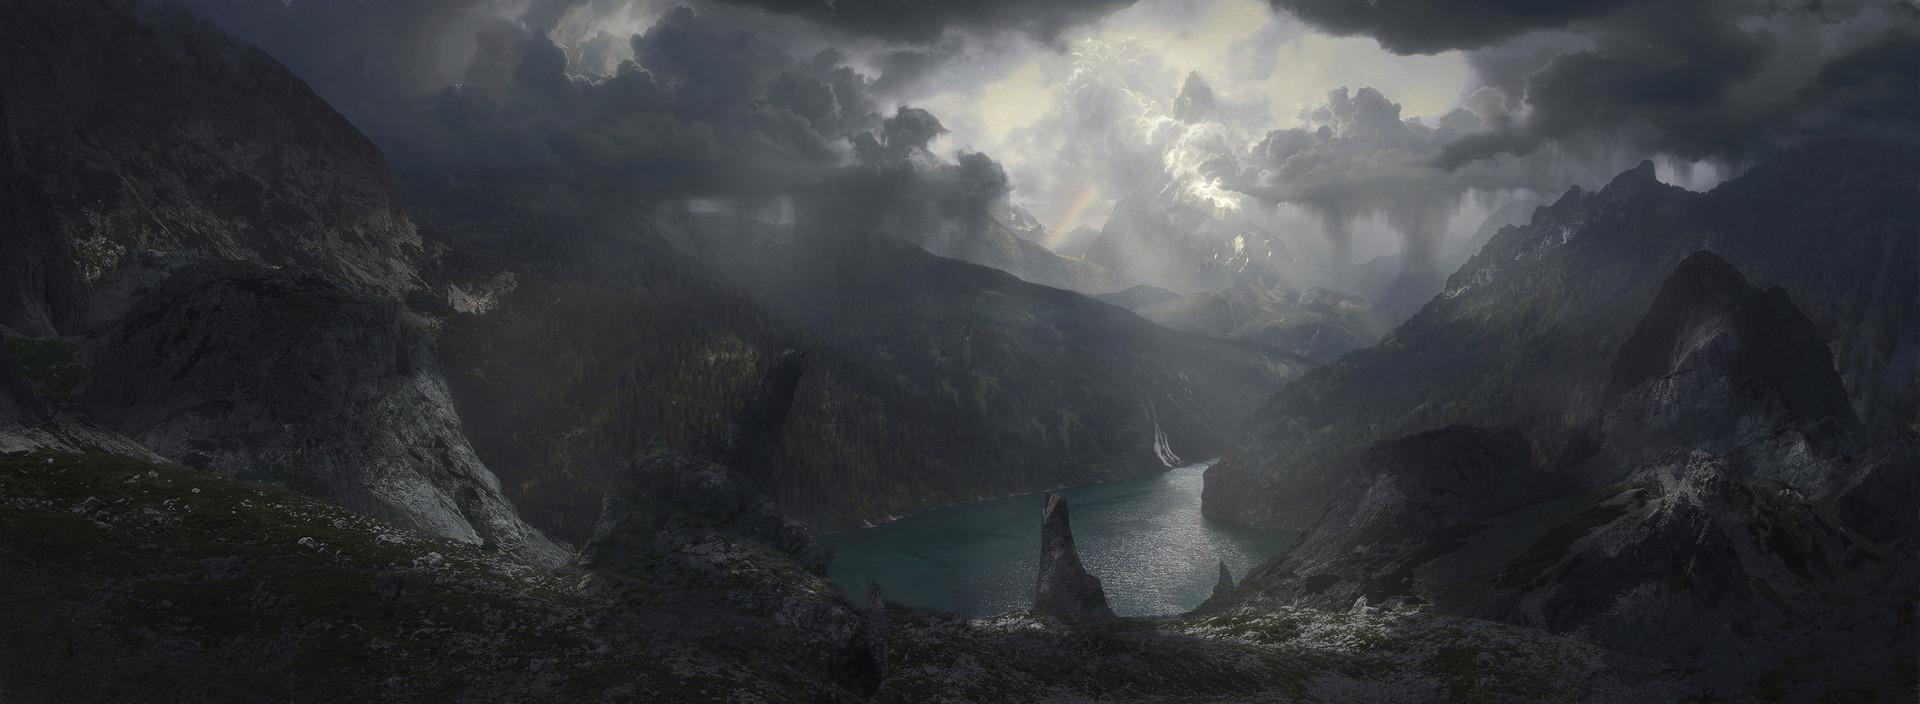 Josu solano w valley storm lowres